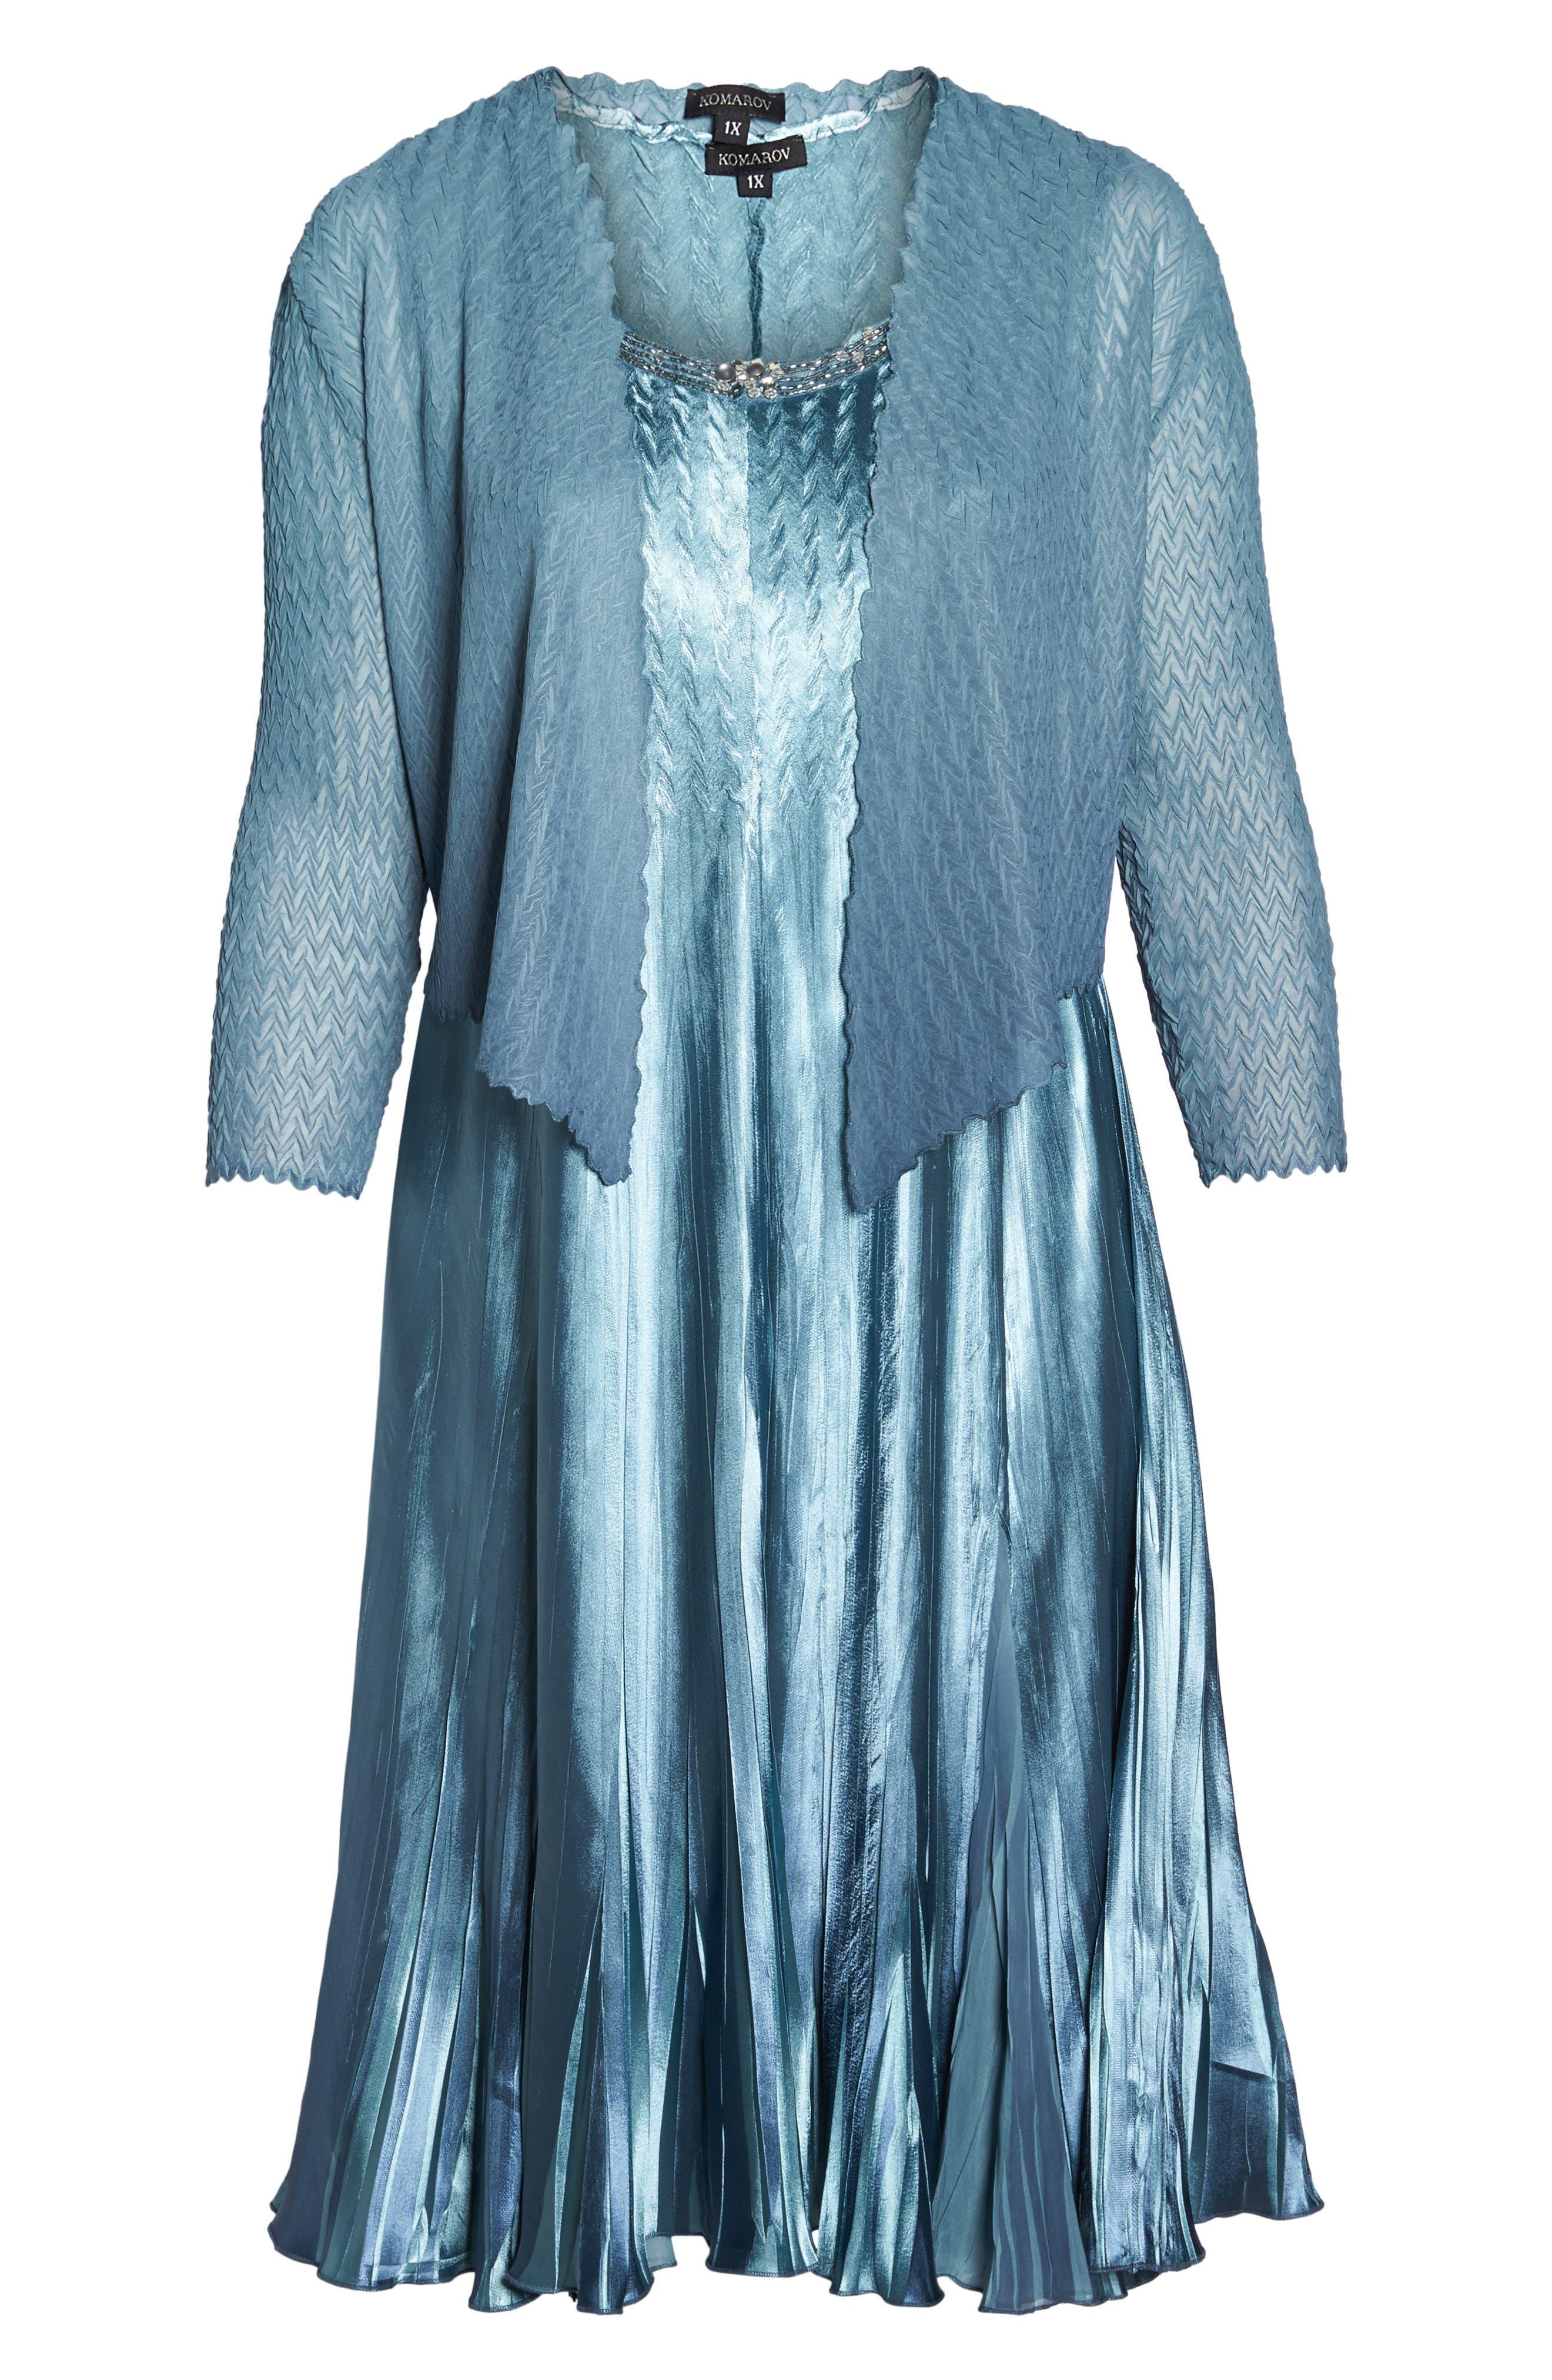 Embellished Charmeuse & Chiffon Dress with Jacket,                             Alternate thumbnail 6, color,                             460